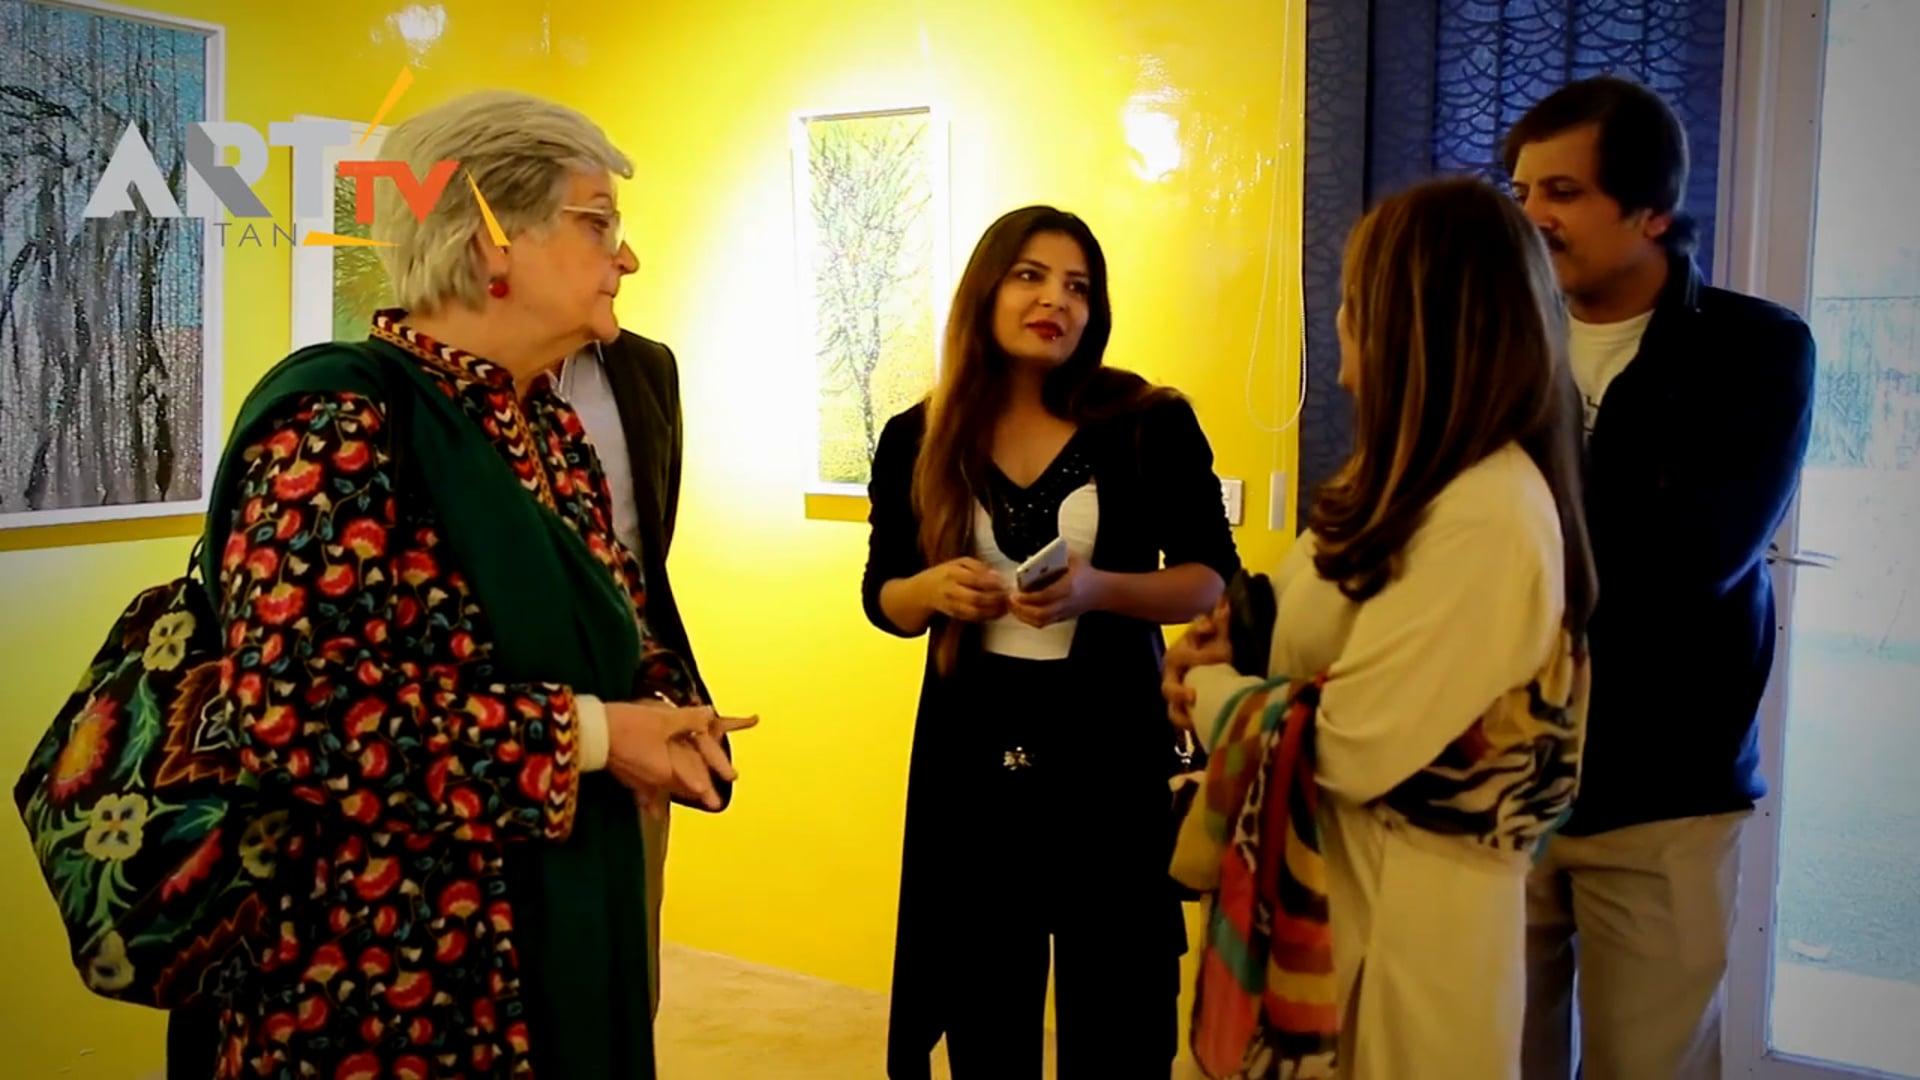 Inspace by Soraya Sikander at Unicorn Gallery